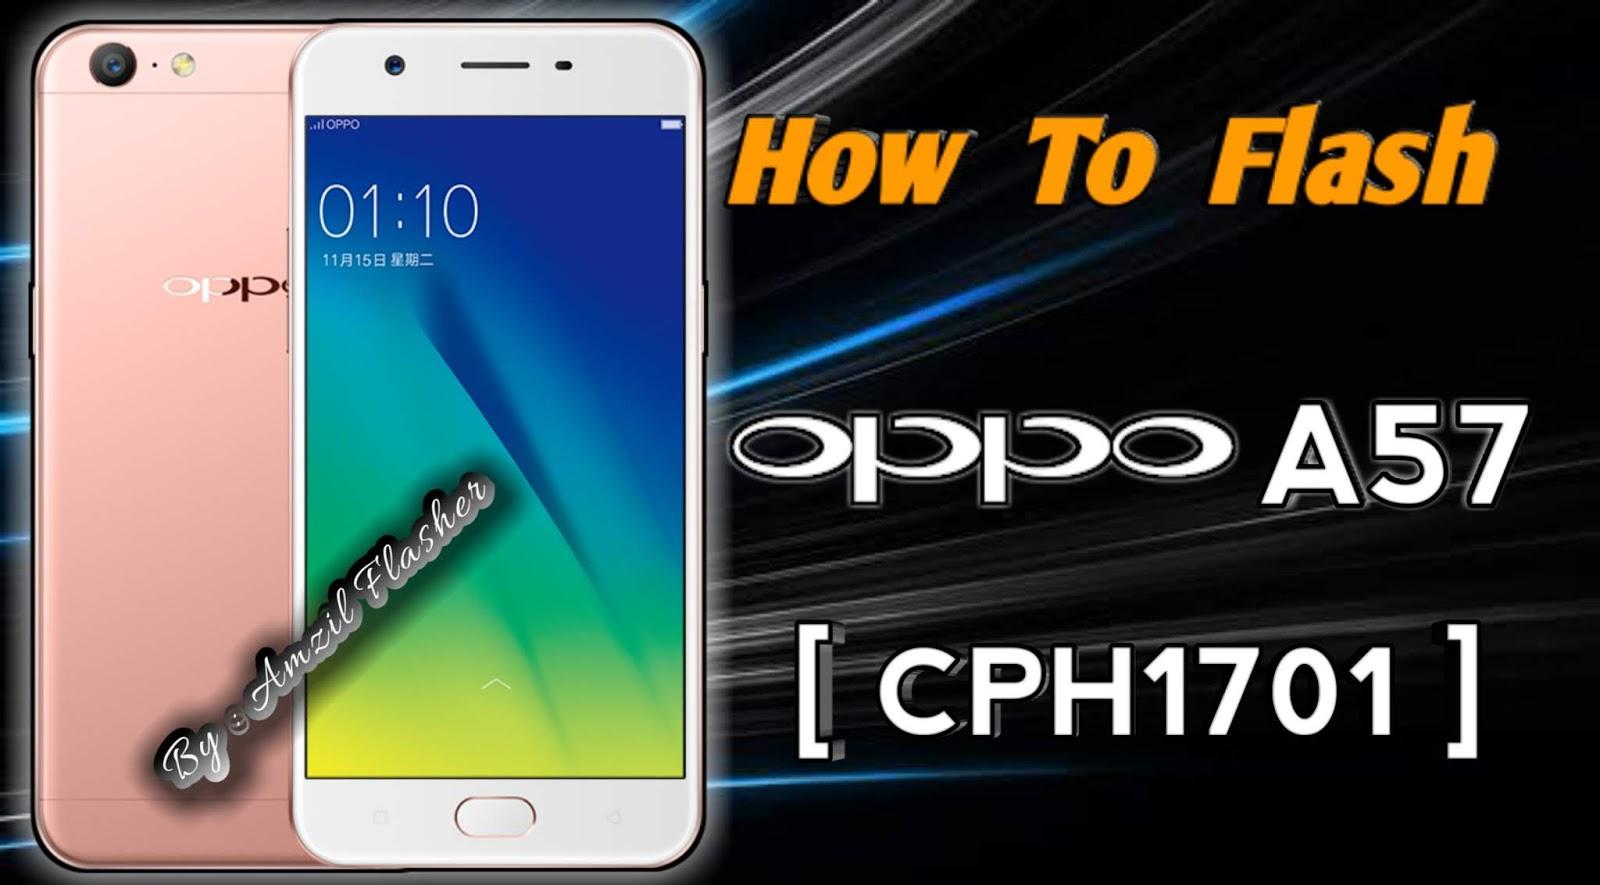 Cara Flash Oppo A57  Cph1701    Tested 1000  Work